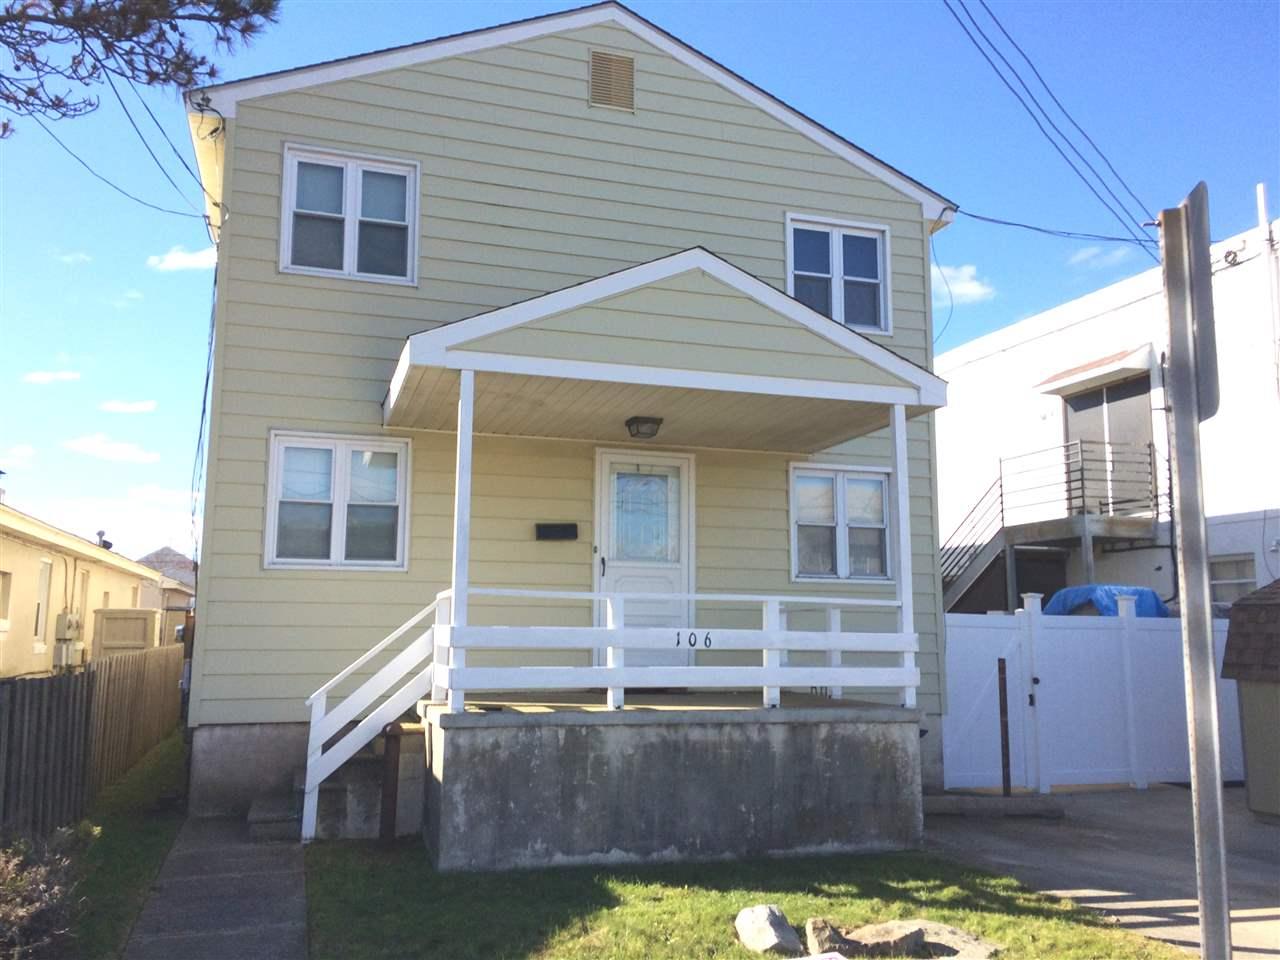 106 E 10th, North Wildwood, NJ 08260